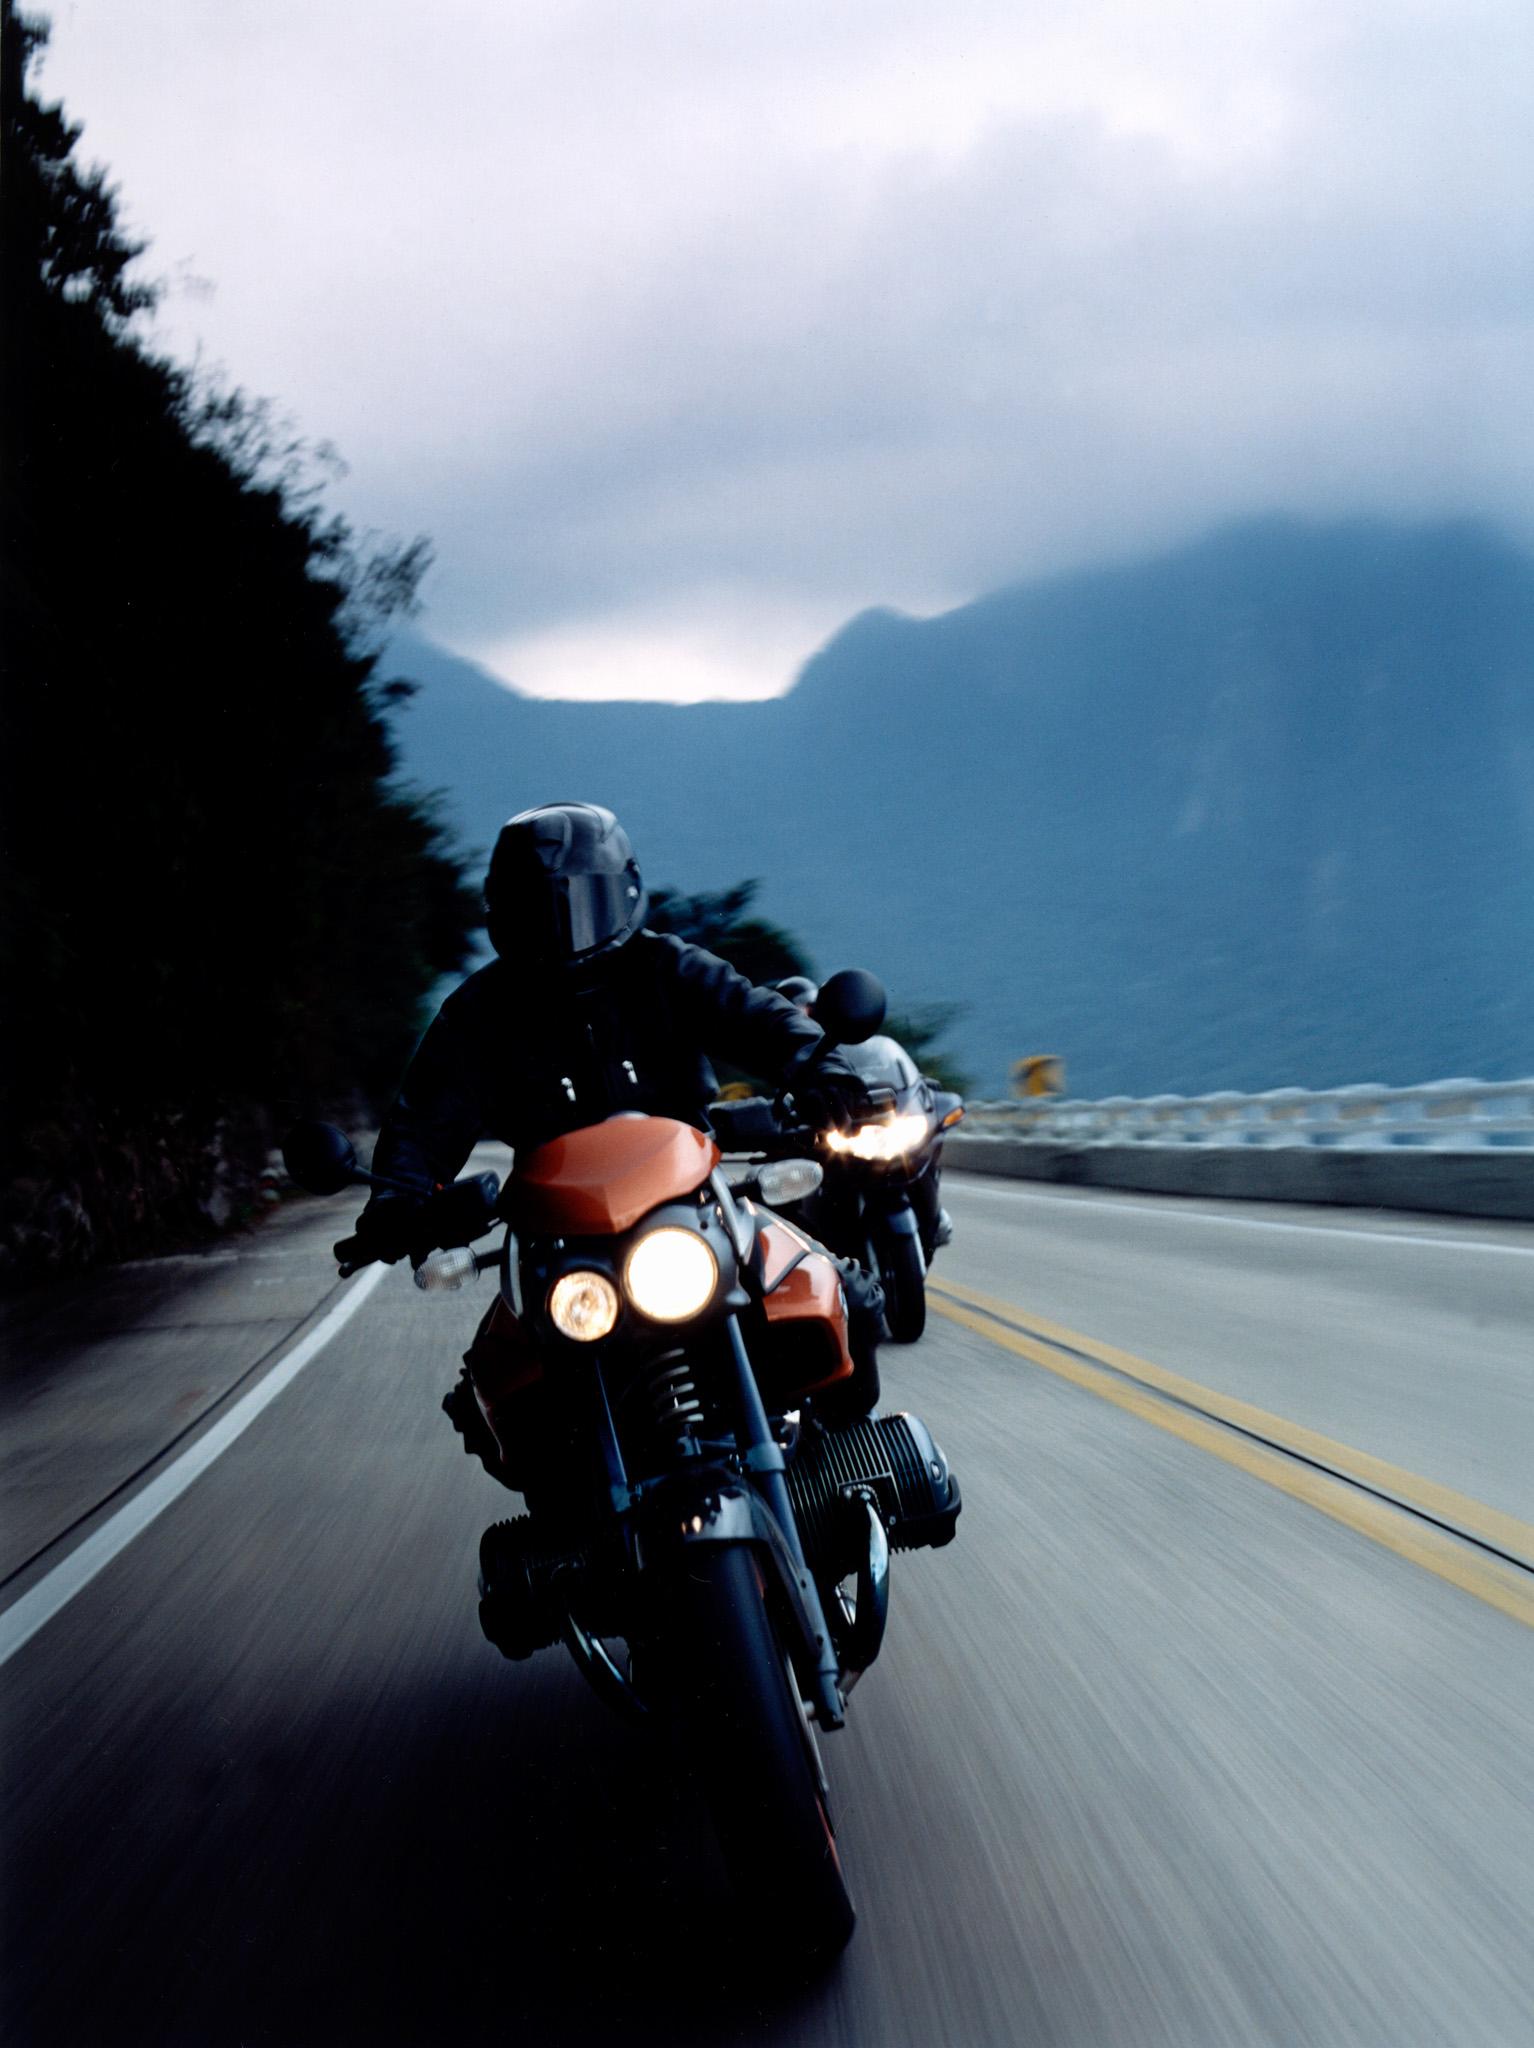 marvelous bmwmotorcycles #5: bmw-motorcycles-brazil-morten